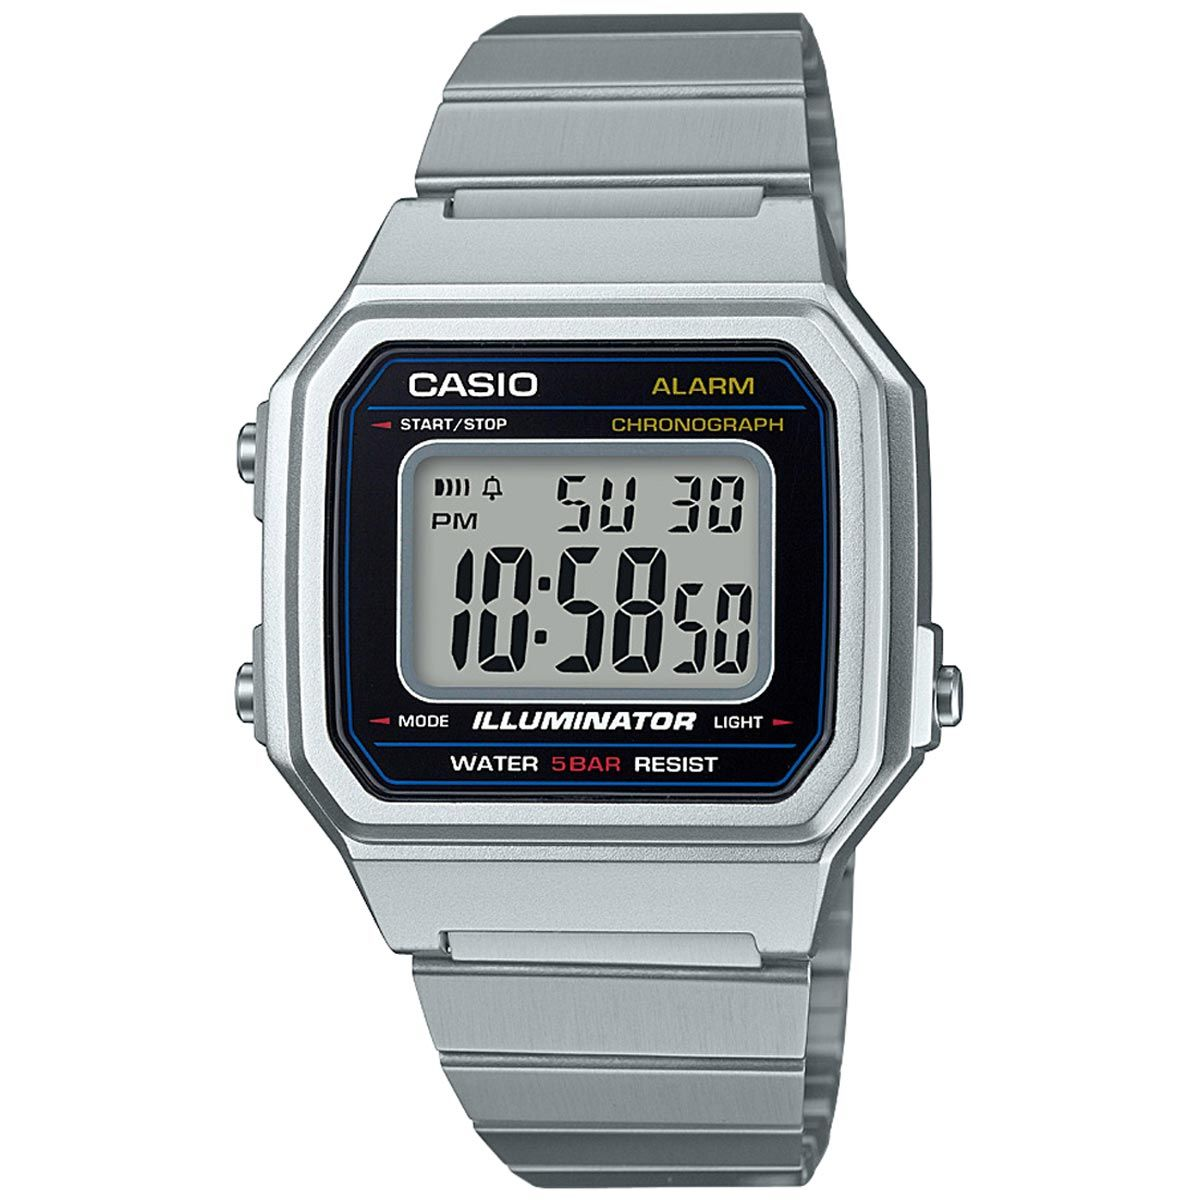 c25d55680d9 Relógio Casio Vintage B650WD-1ADF - Relógios de Fabrica